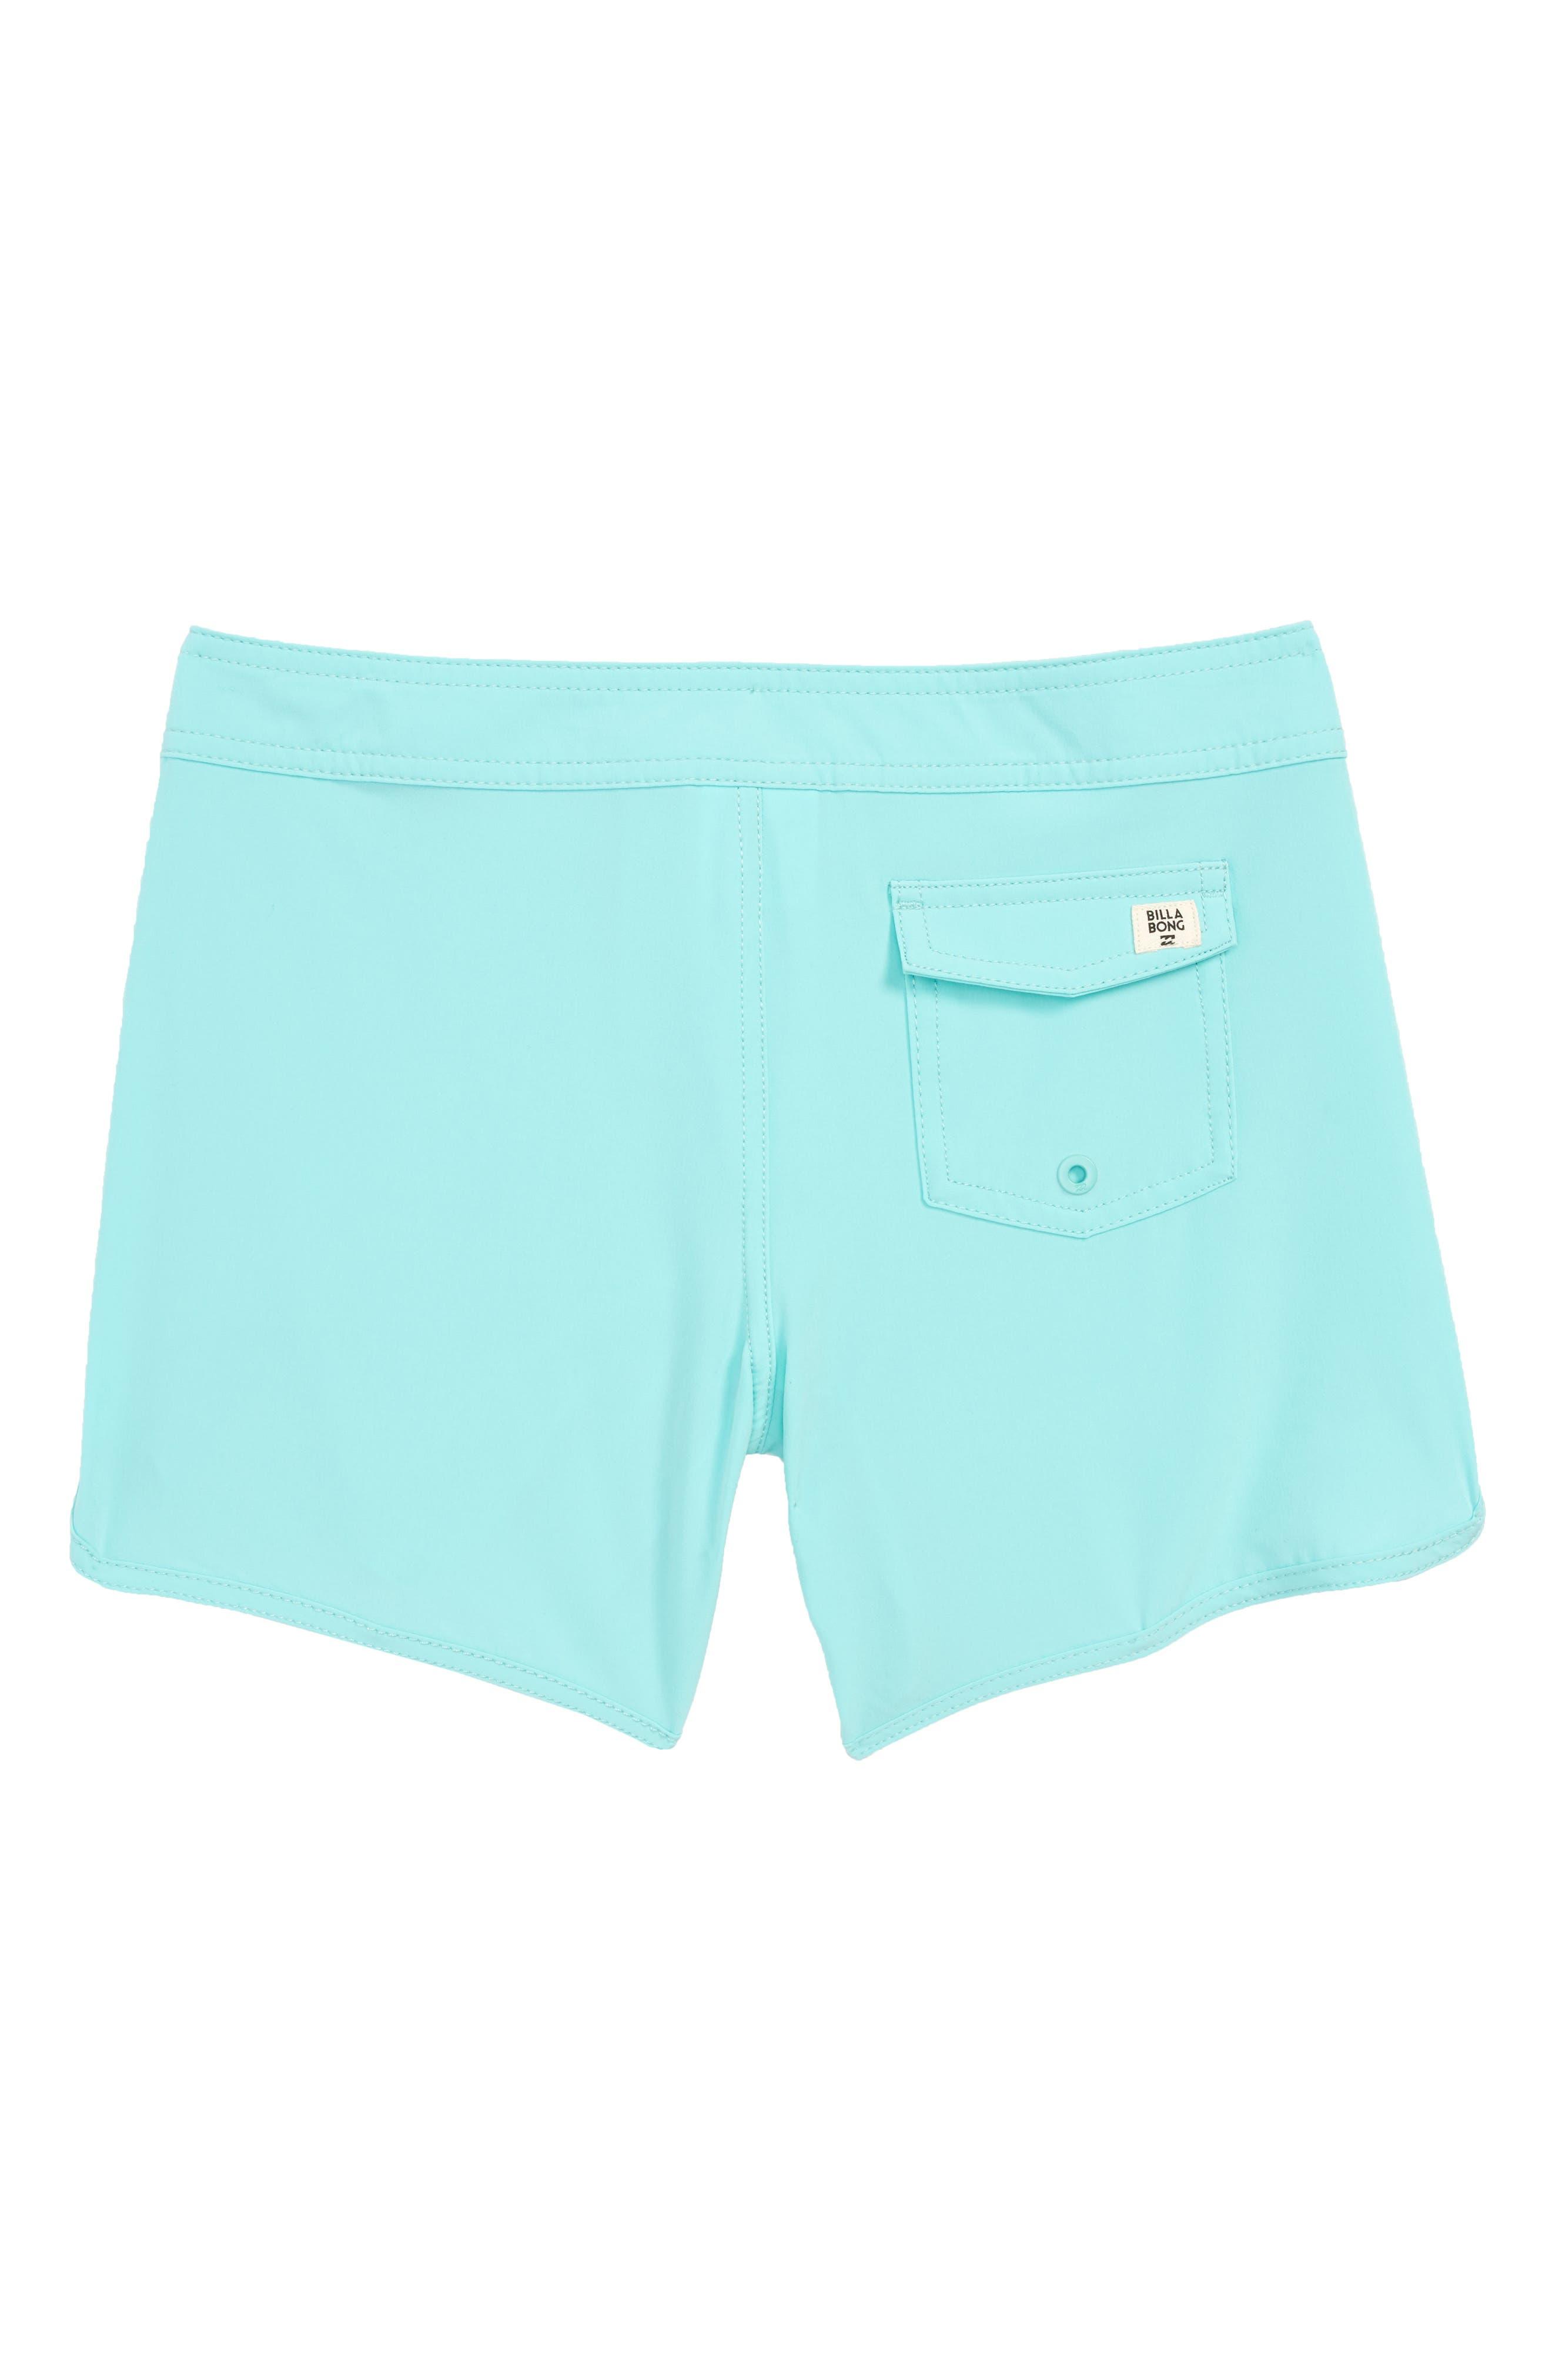 Sol Searcher Board Shorts,                             Alternate thumbnail 2, color,                             Beach Glass